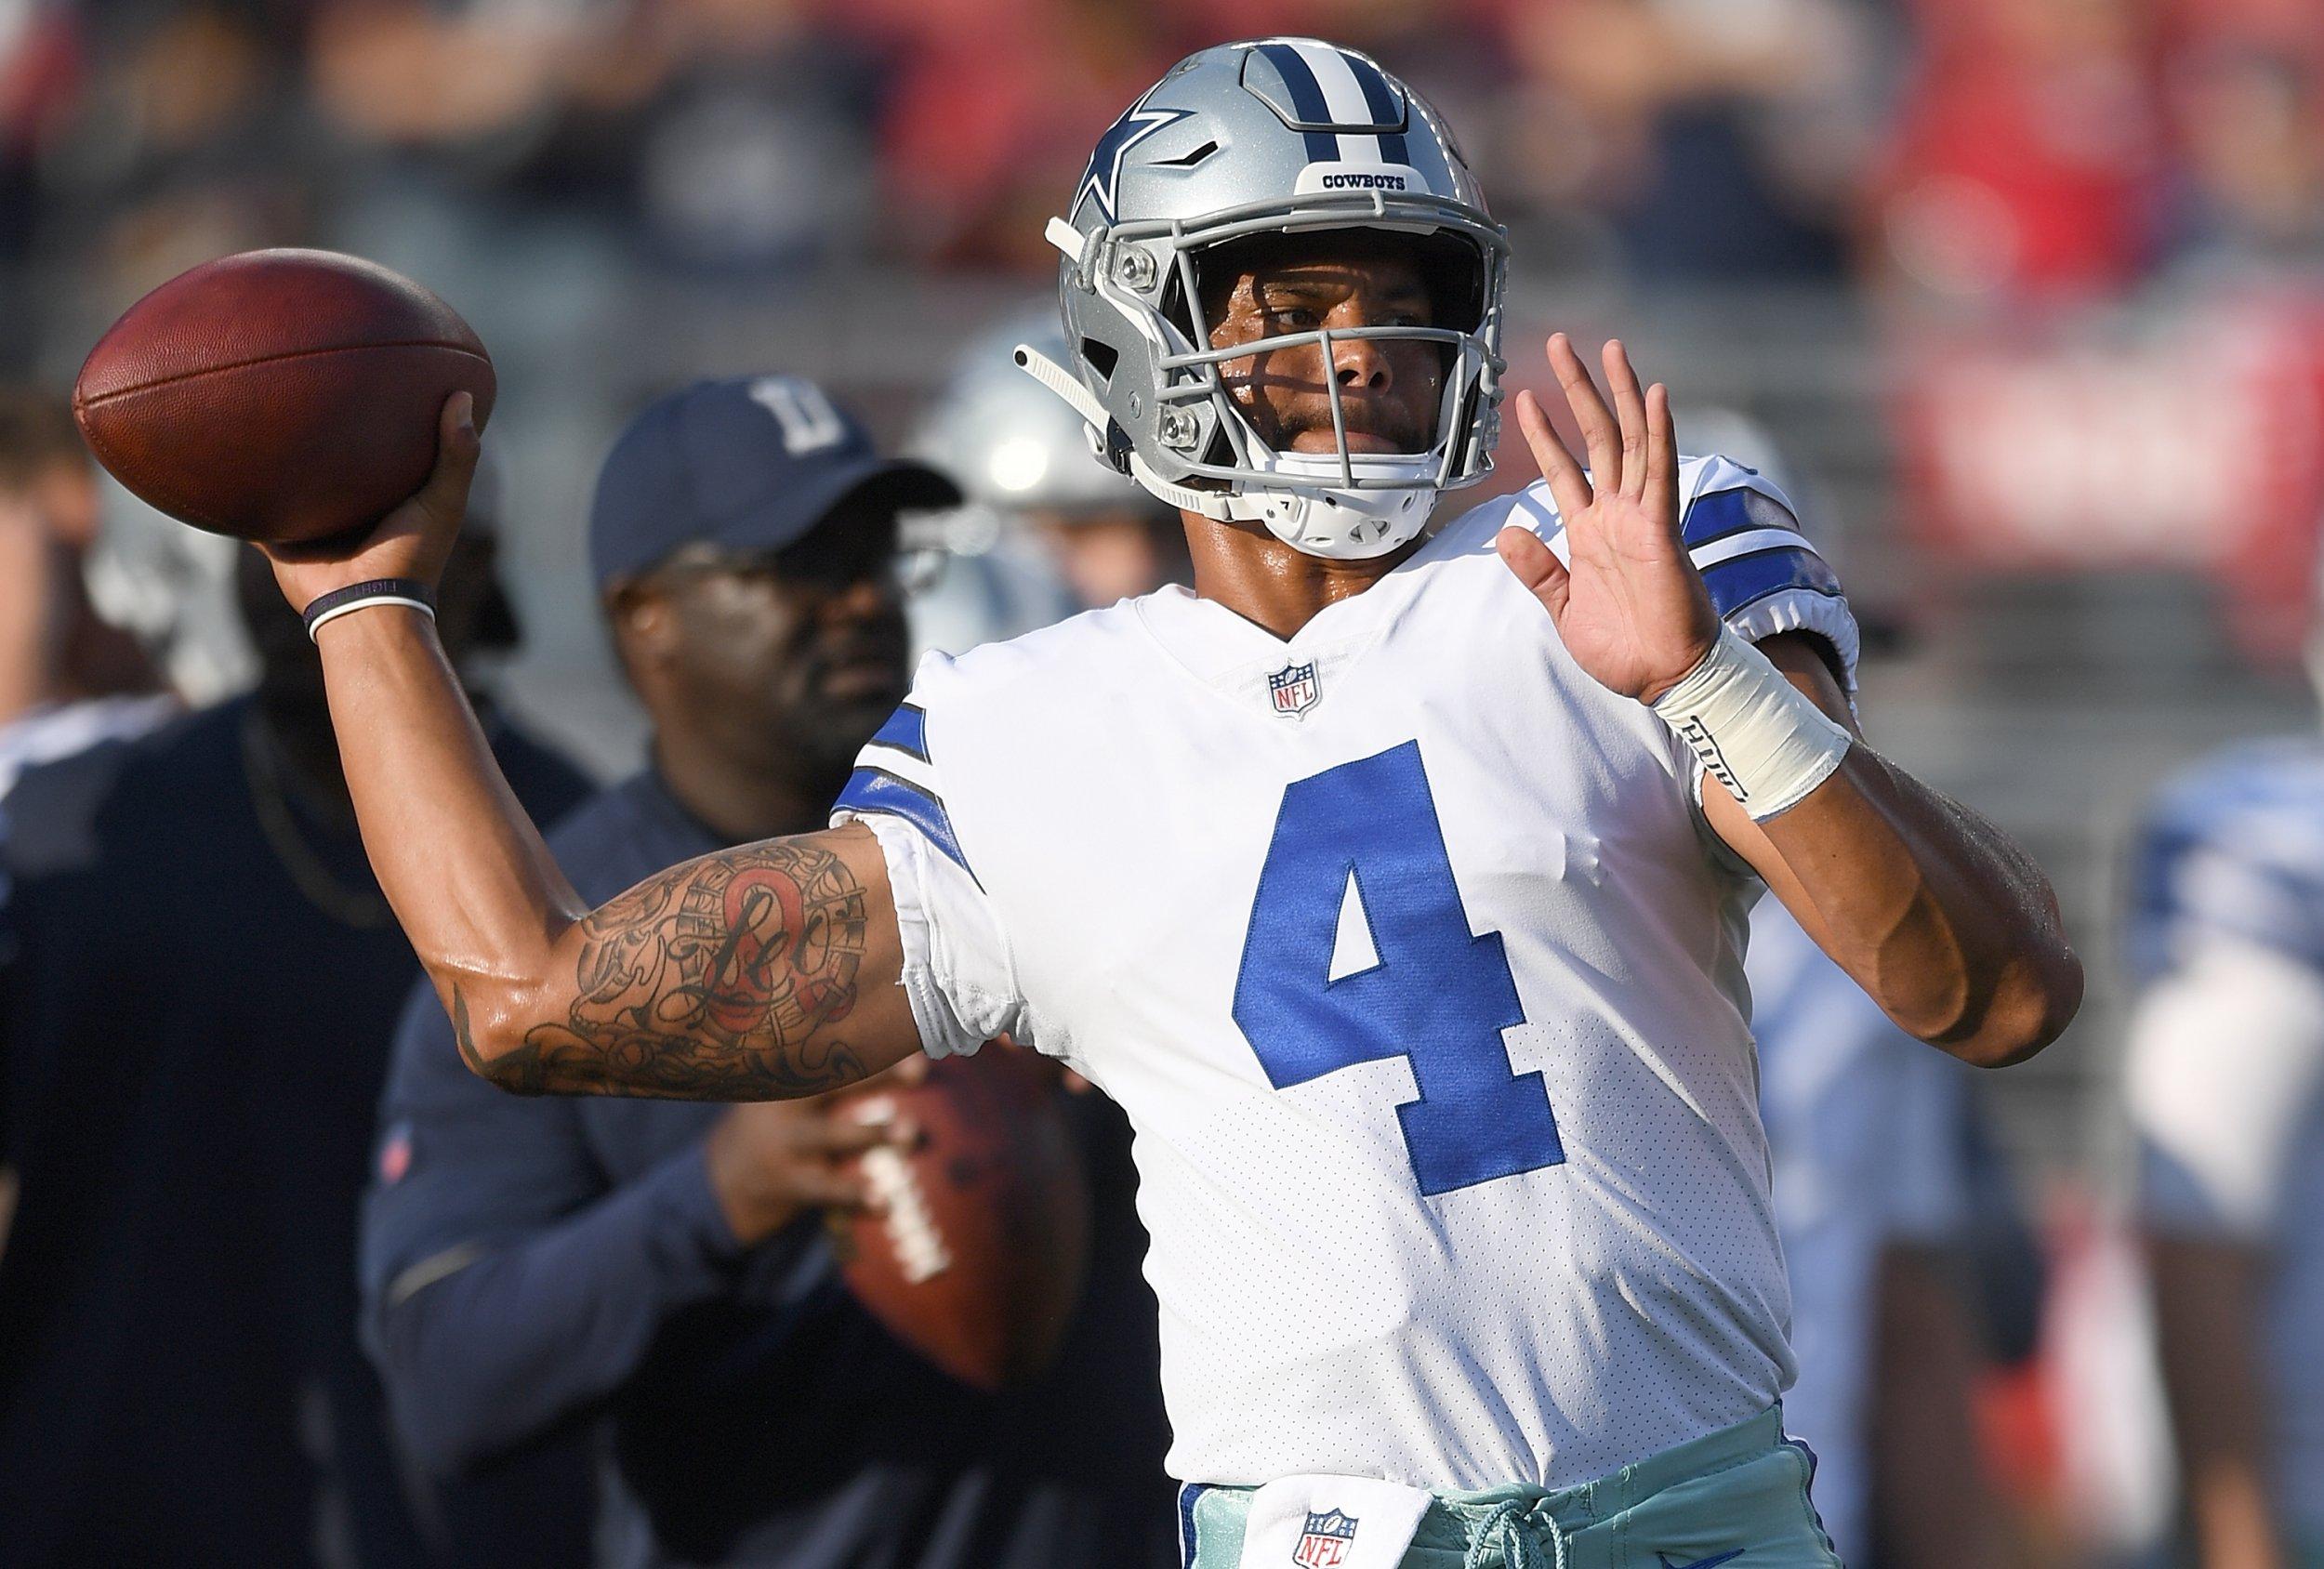 Dallas Cowboys vs. Cincinnati Bengals TV Channel, Live Stream, Start Time for 2018 Preseason Game